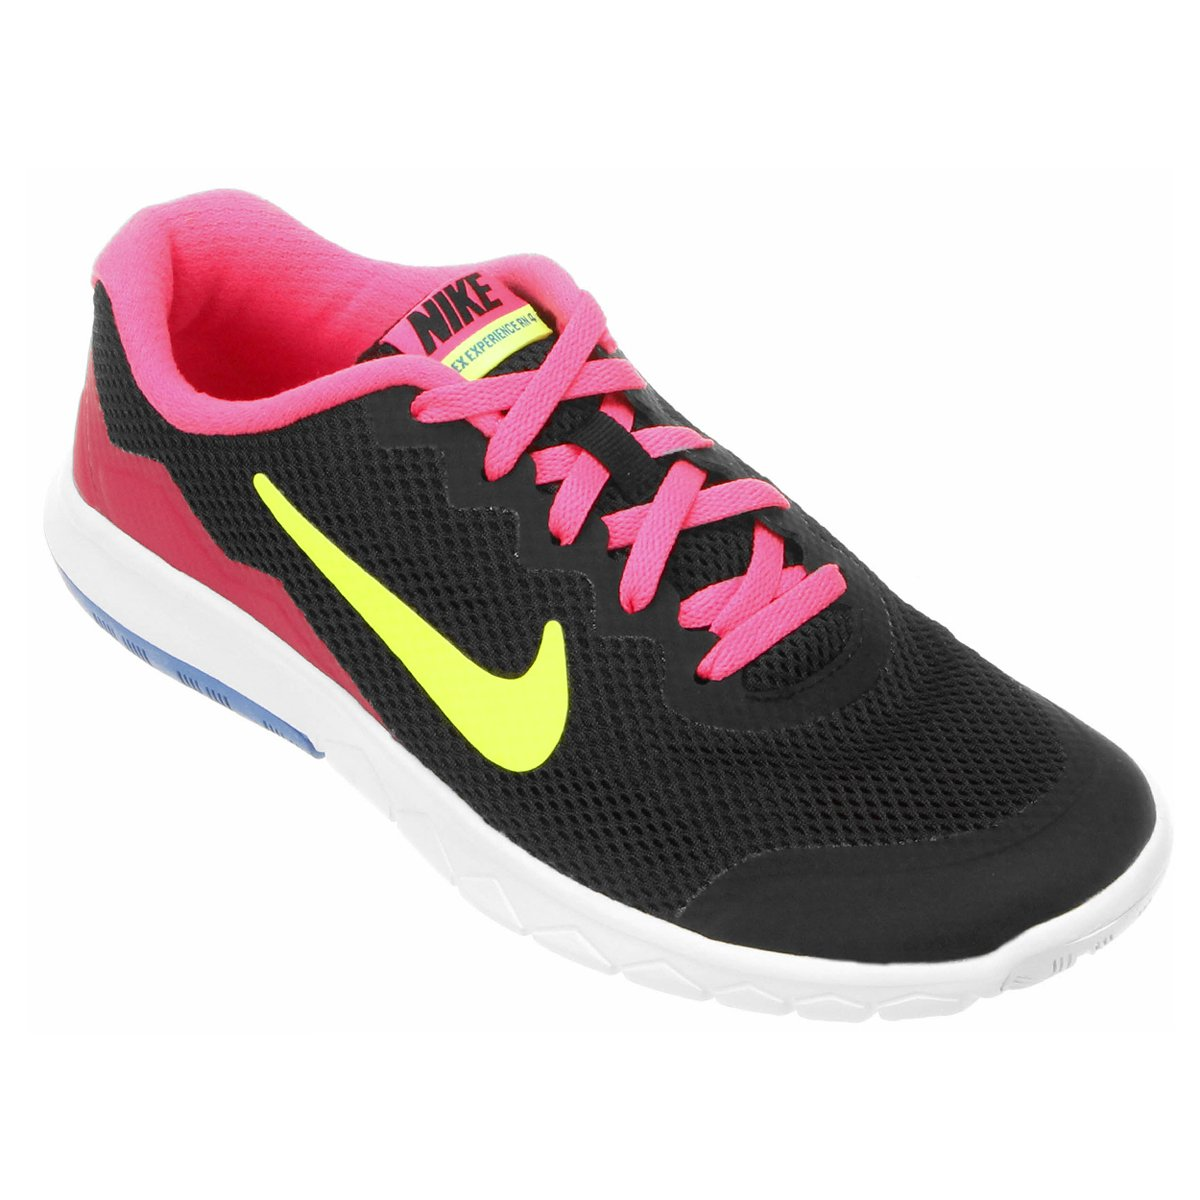 Tênis Nike Flex Experience 4 Infantil - Compre Agora  b542b4a52137a